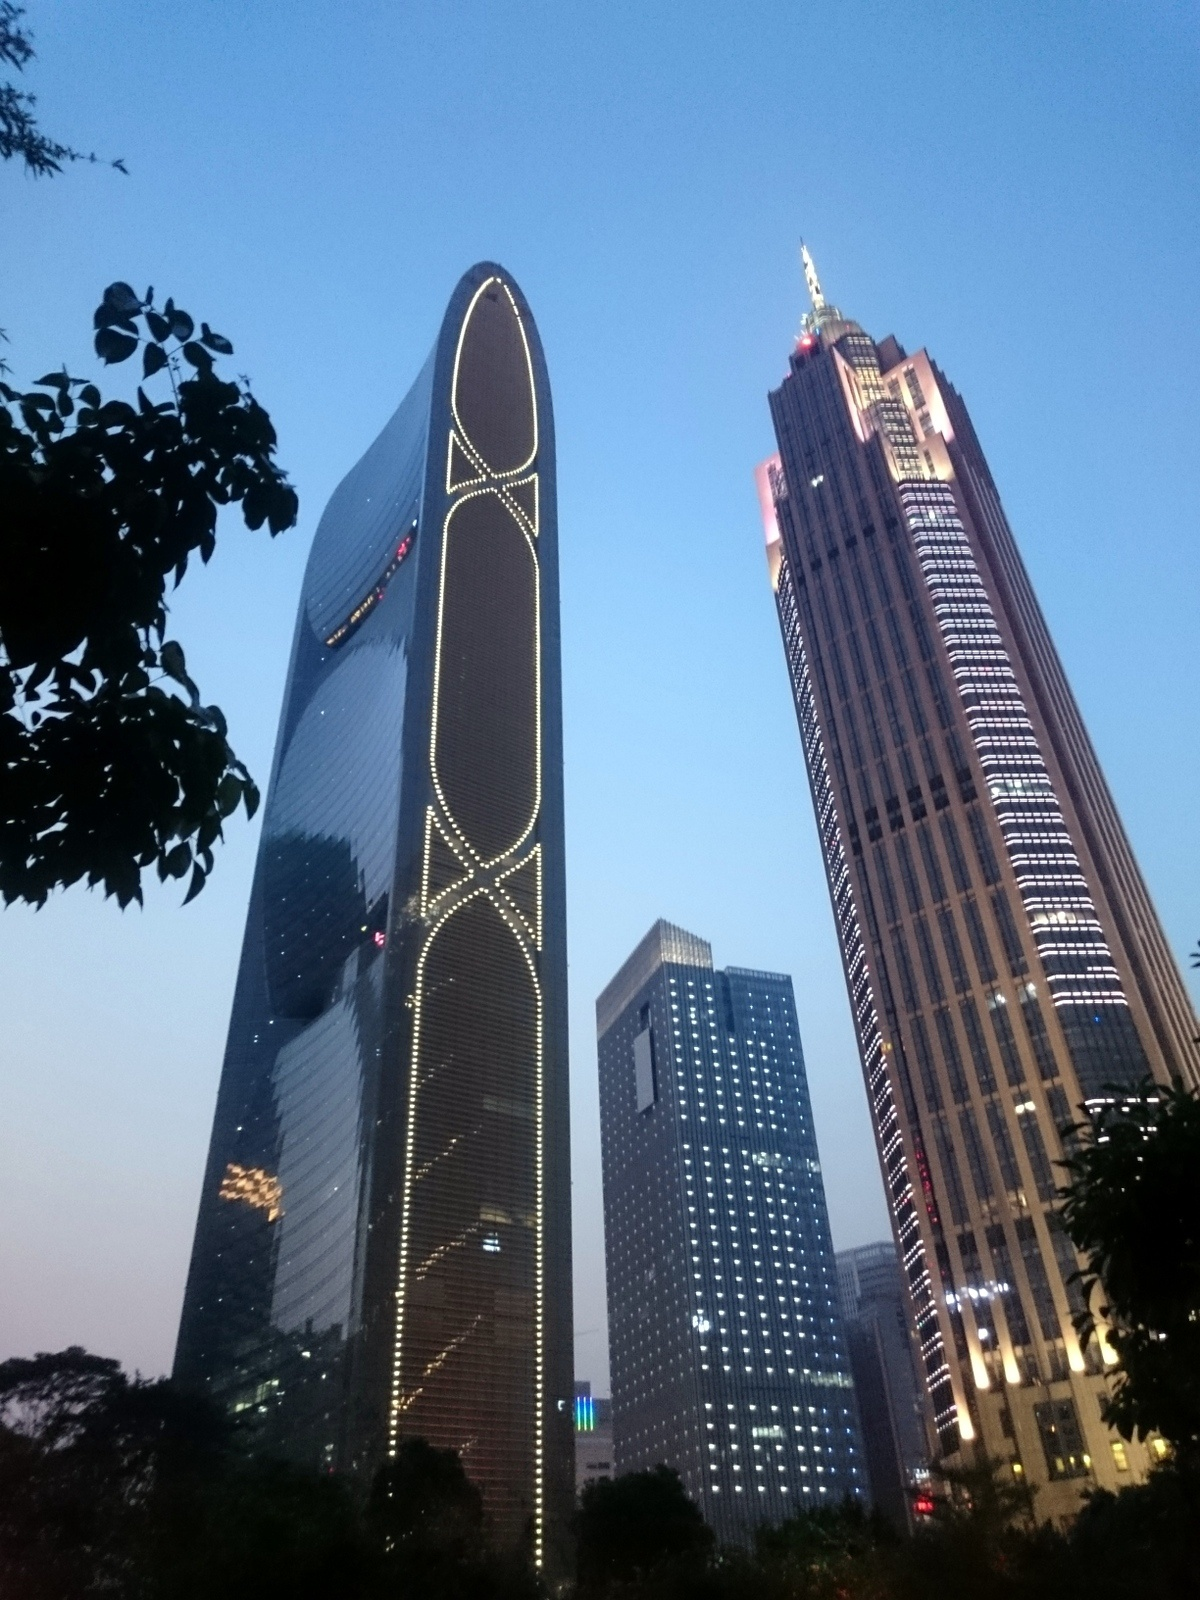 Китай. Завод устройств для «Умного дома». Учимся и учим - 5